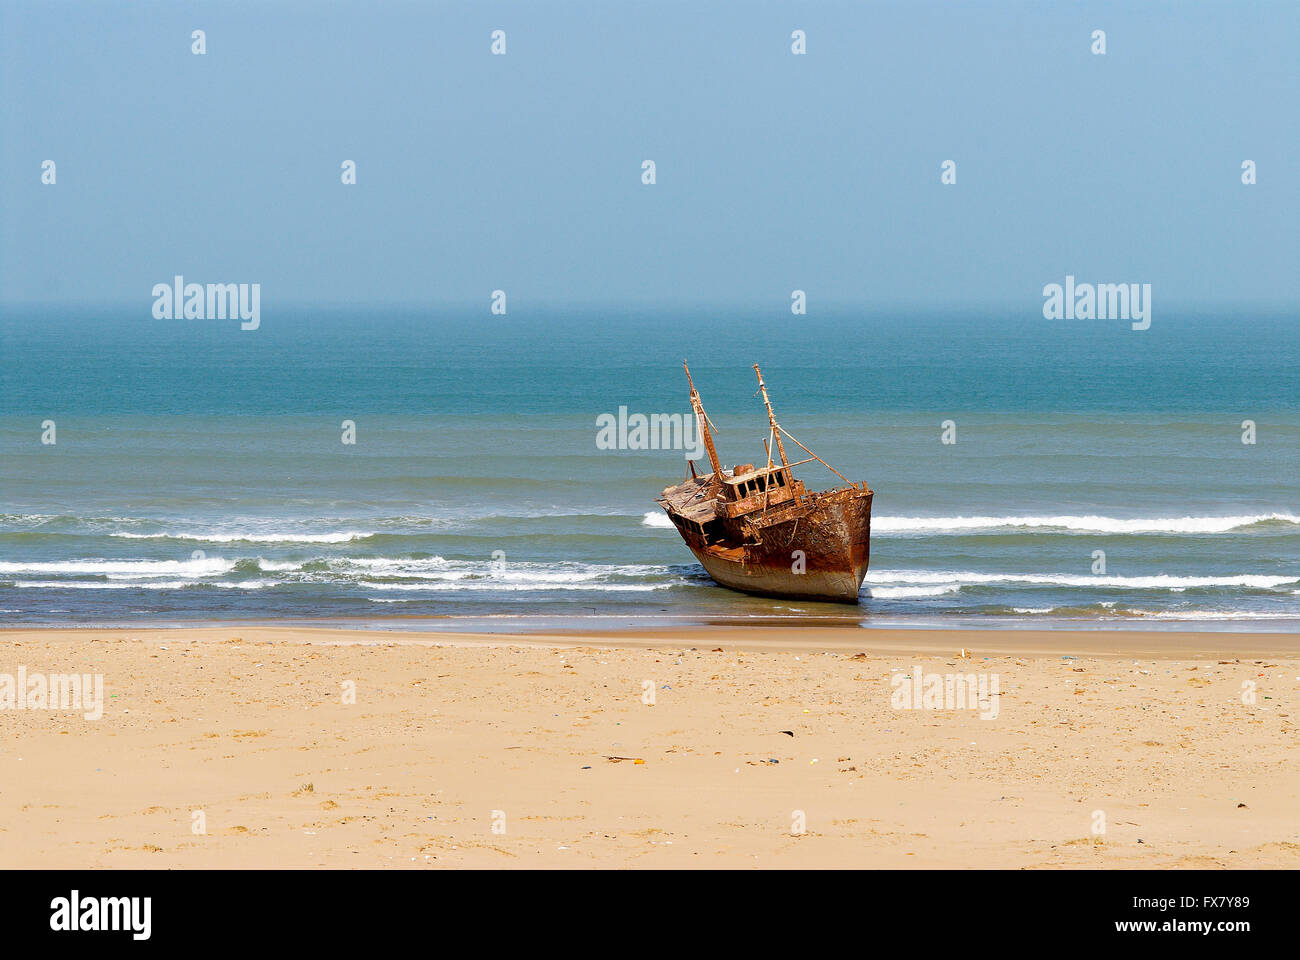 Maroc. Grand Sud. Route de Laayoune. Cote Atlantique. Epave de bateau. Ancien Sahara espagnol. // Morocco. South - Stock Image